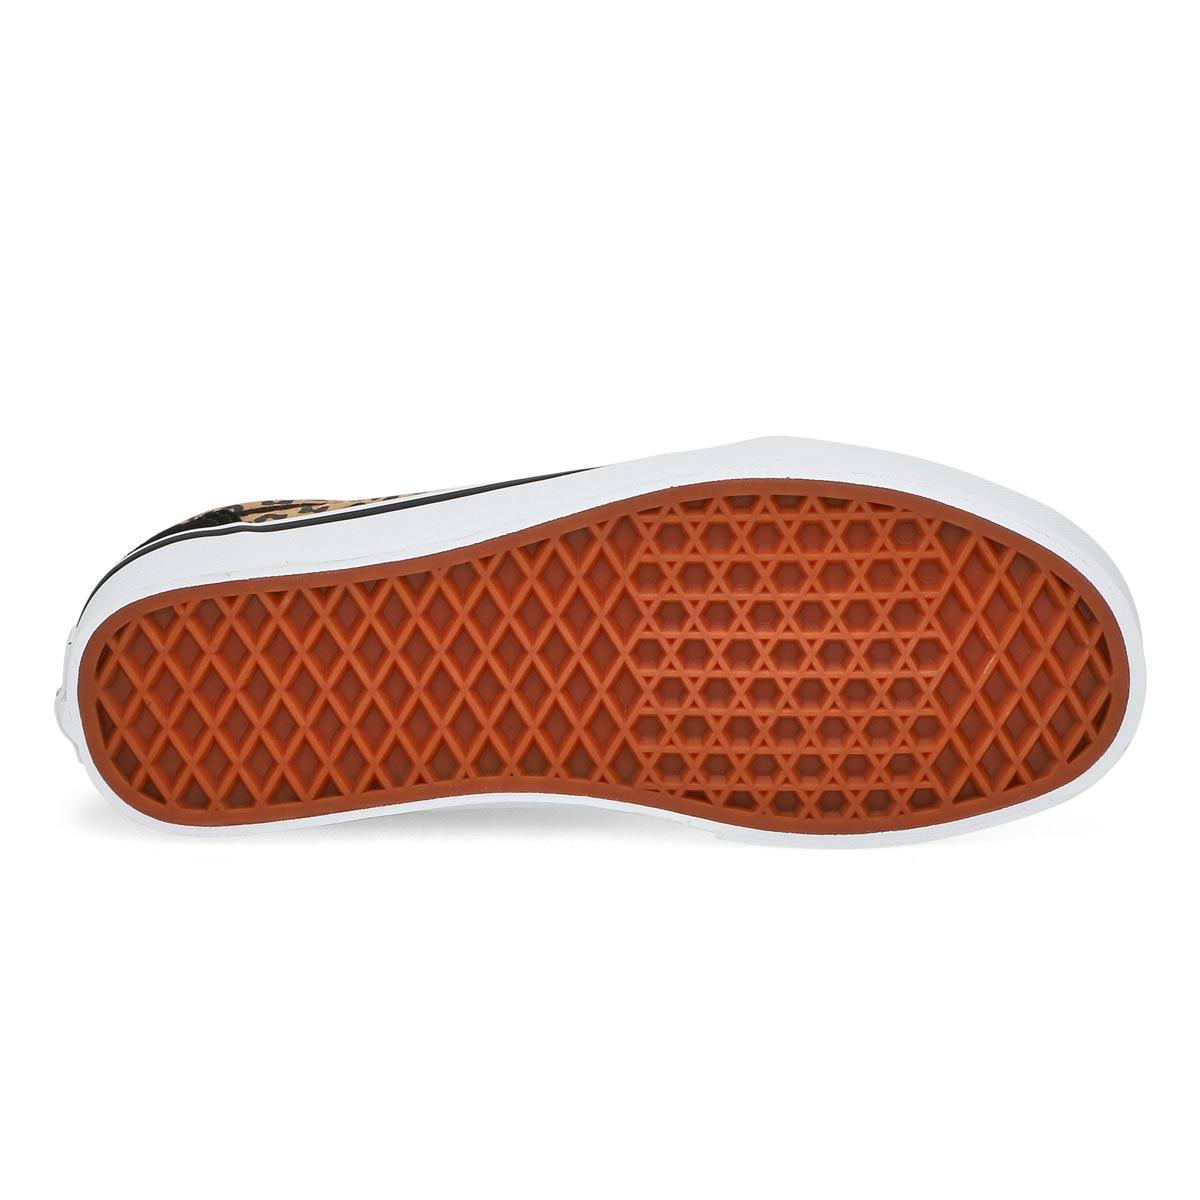 Women's Ward Sneaker - Cheetah